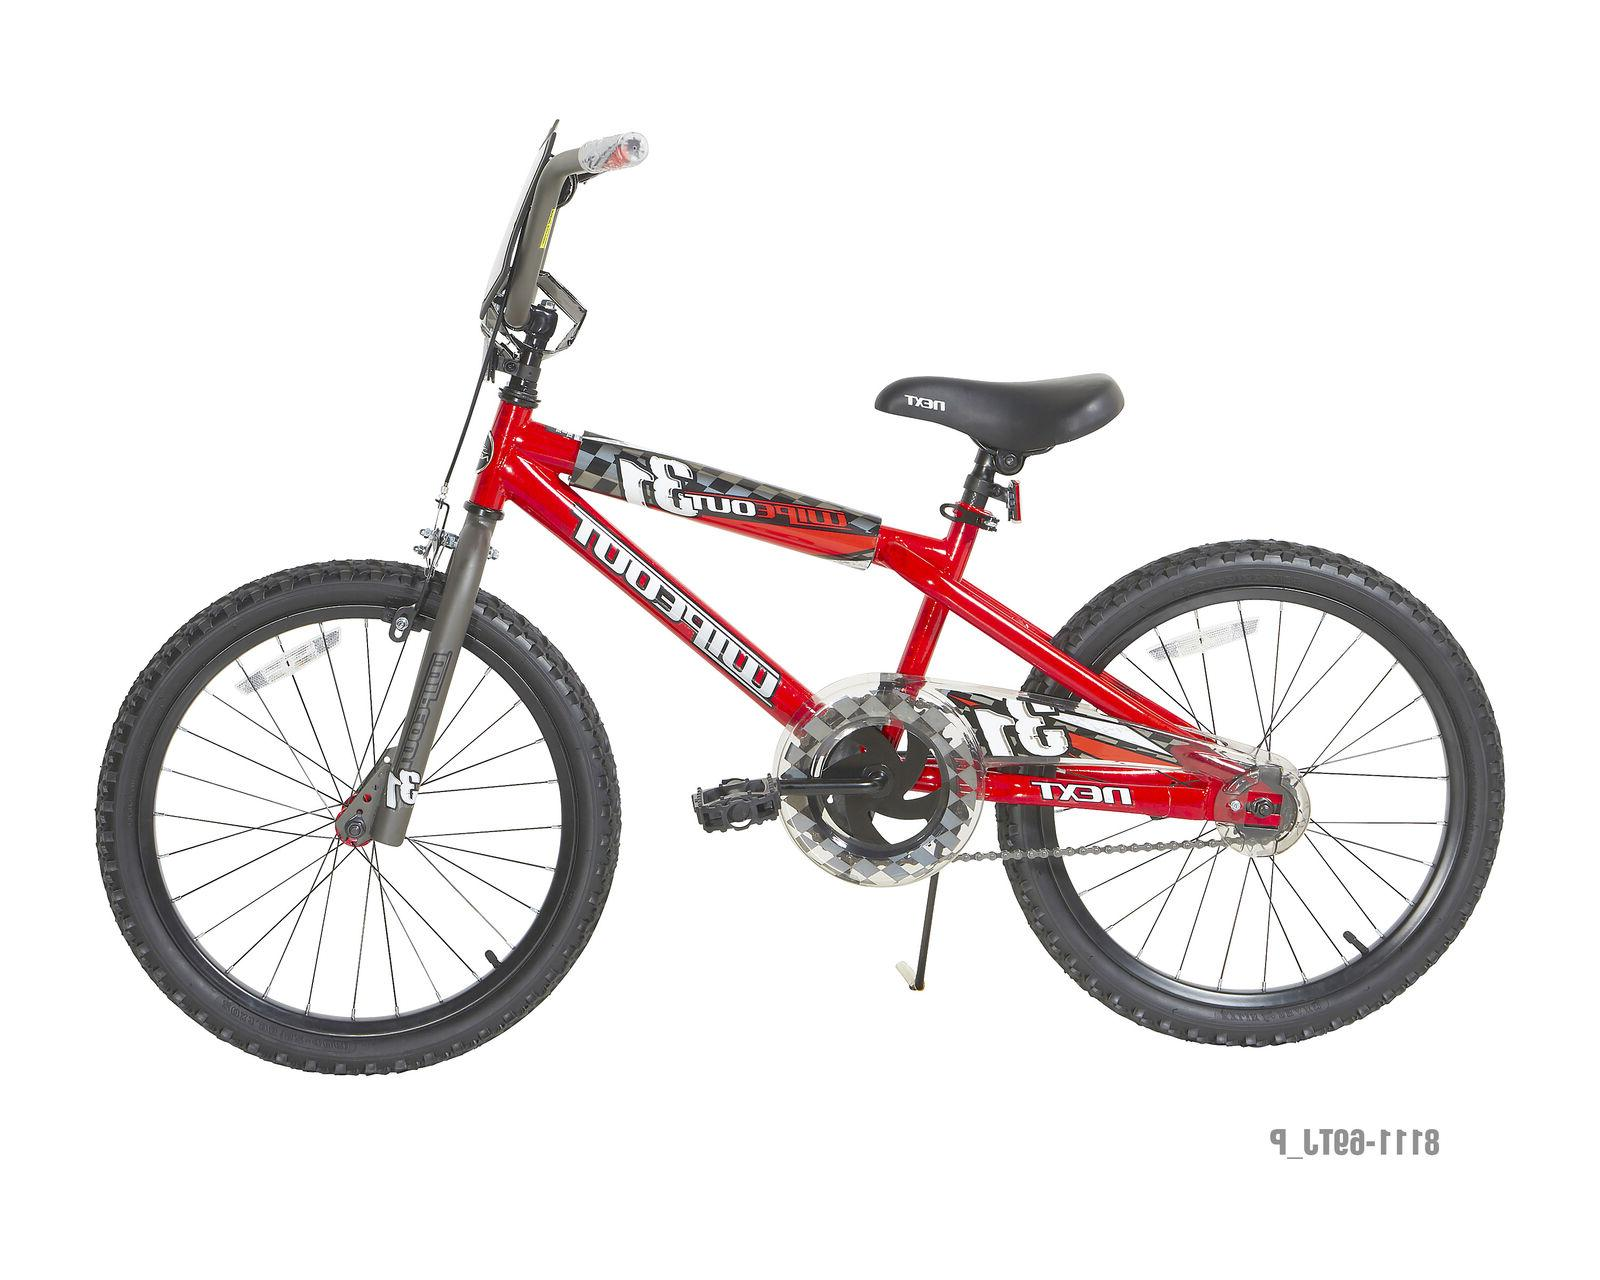 Boys 20 Inch Bike >> Bmx Bikes For Boys Freestyle 20 Inch 1